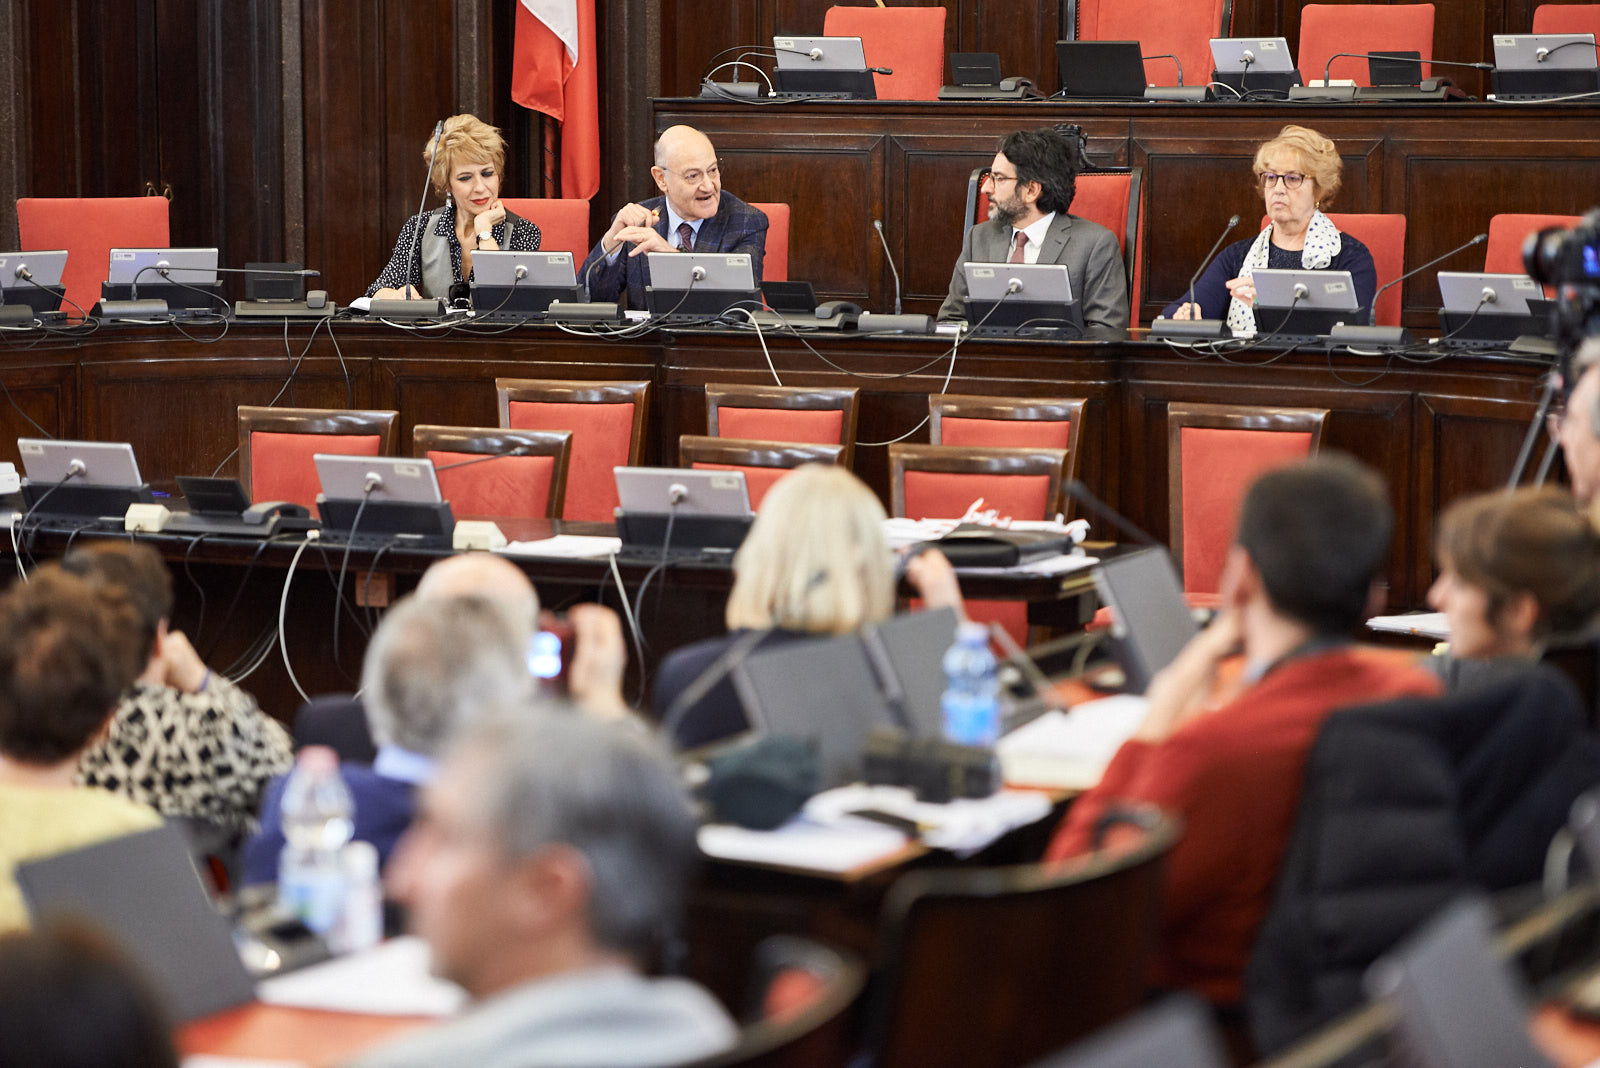 Gianna Coletti, Gabriele Nissim, Lamberto Bertolé and Ulianova Radice